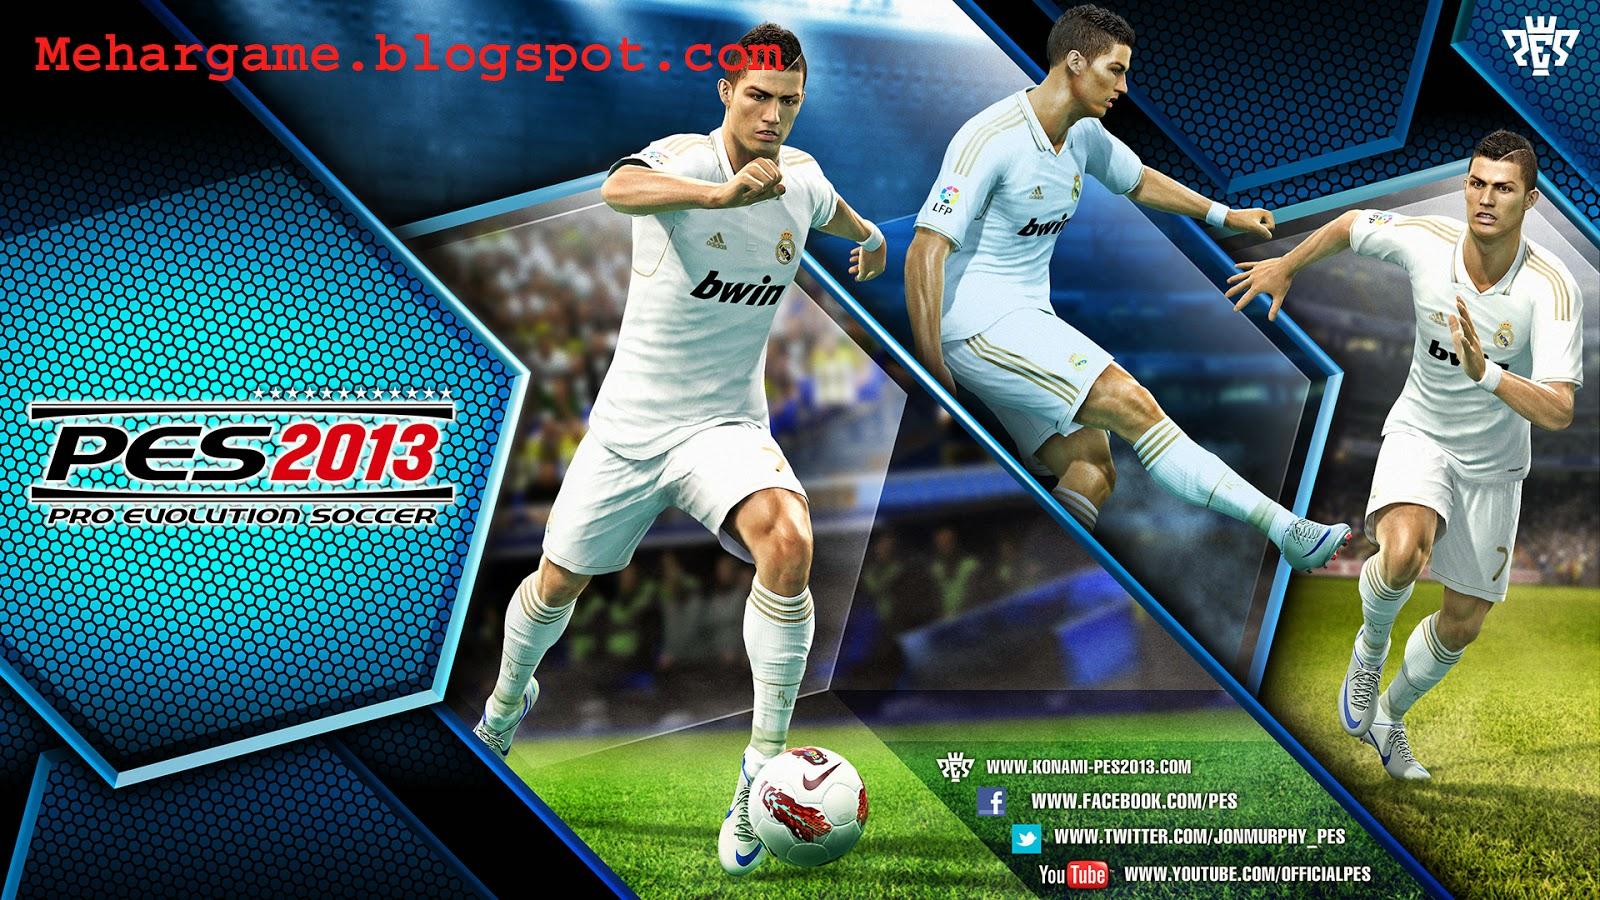 download game pes 2013 compressed